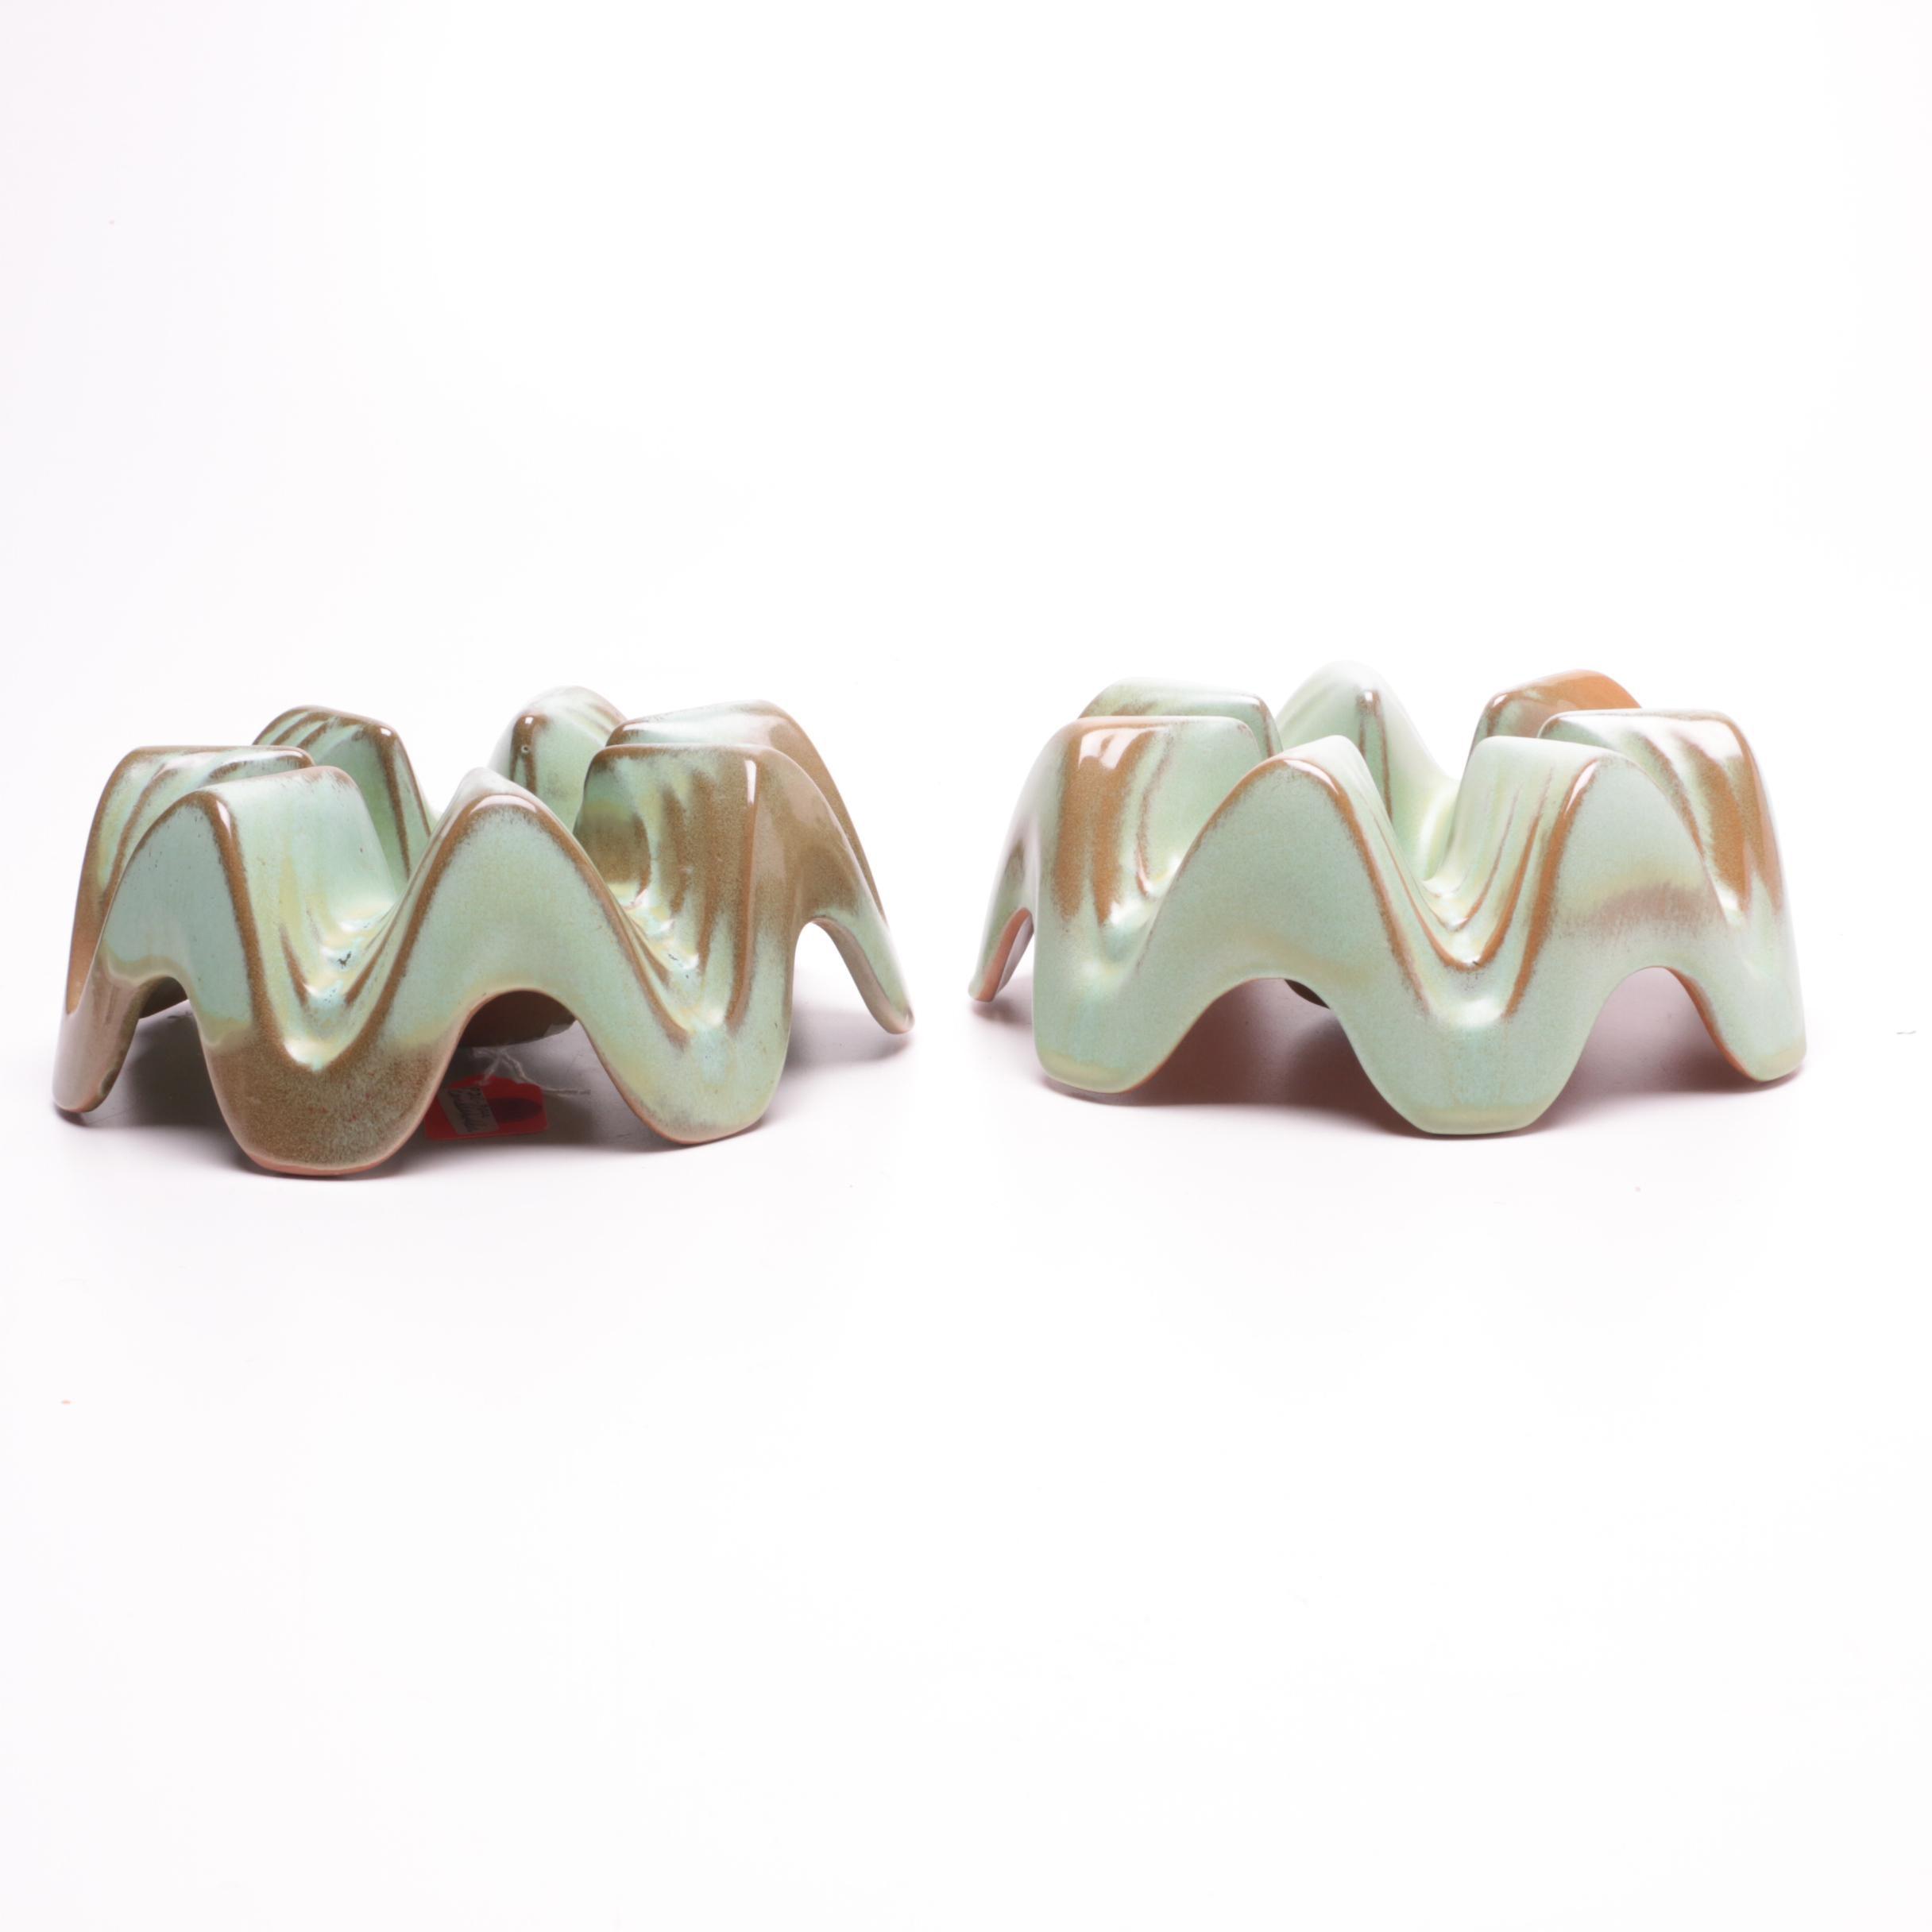 Frankoma Pottery Casserole Warmers